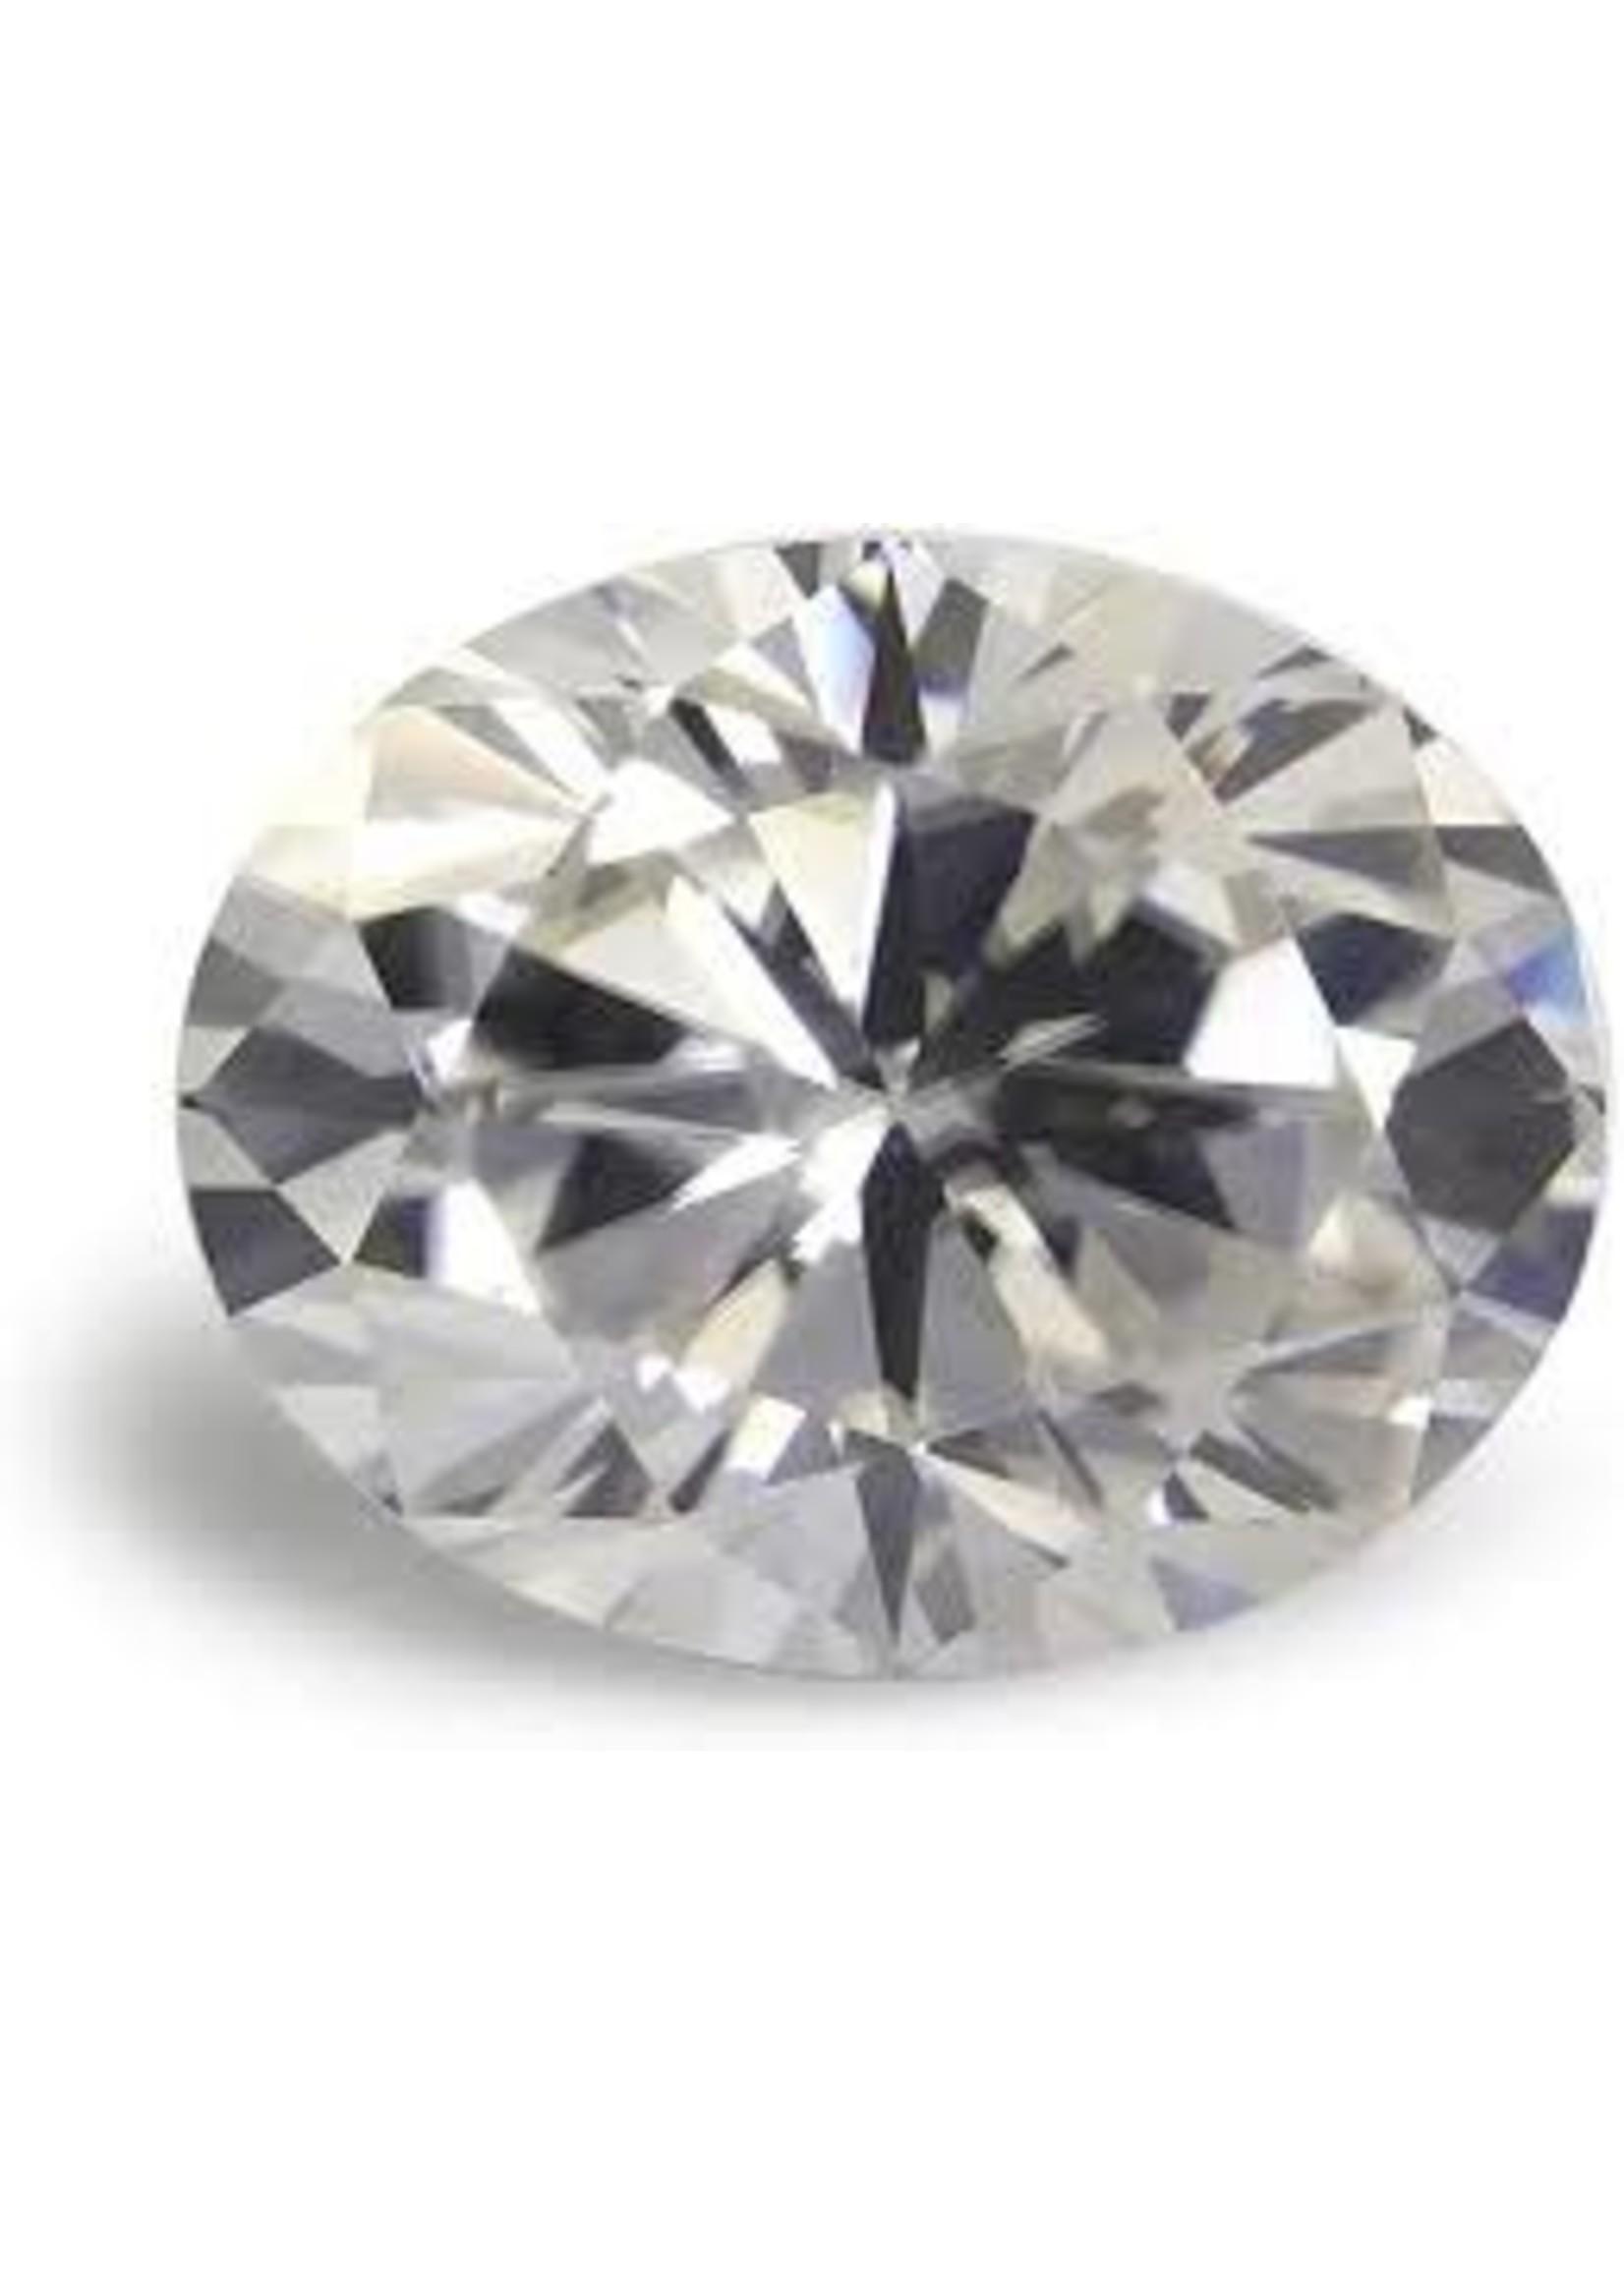 Jewellery 5.97 CT OVAL DIAMOND L VS1 EXCELLENT CUT